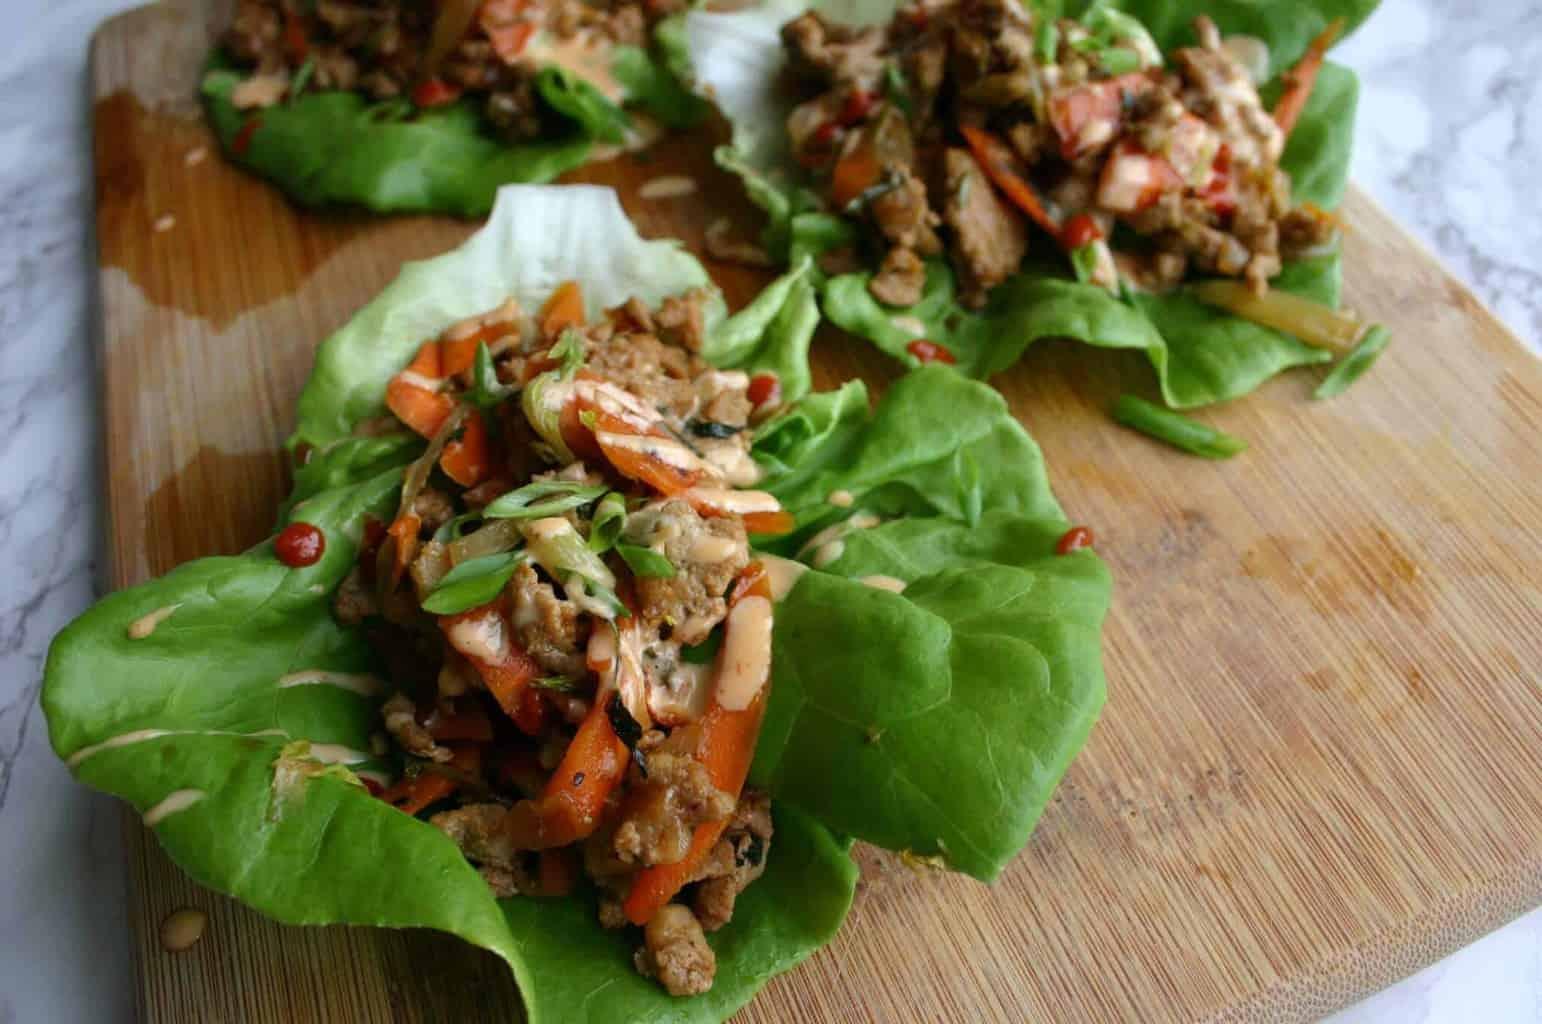 PF Changs Copycat Lettuce Wraps! Healthy Asian Ground Turkey Lettuce Wraps.